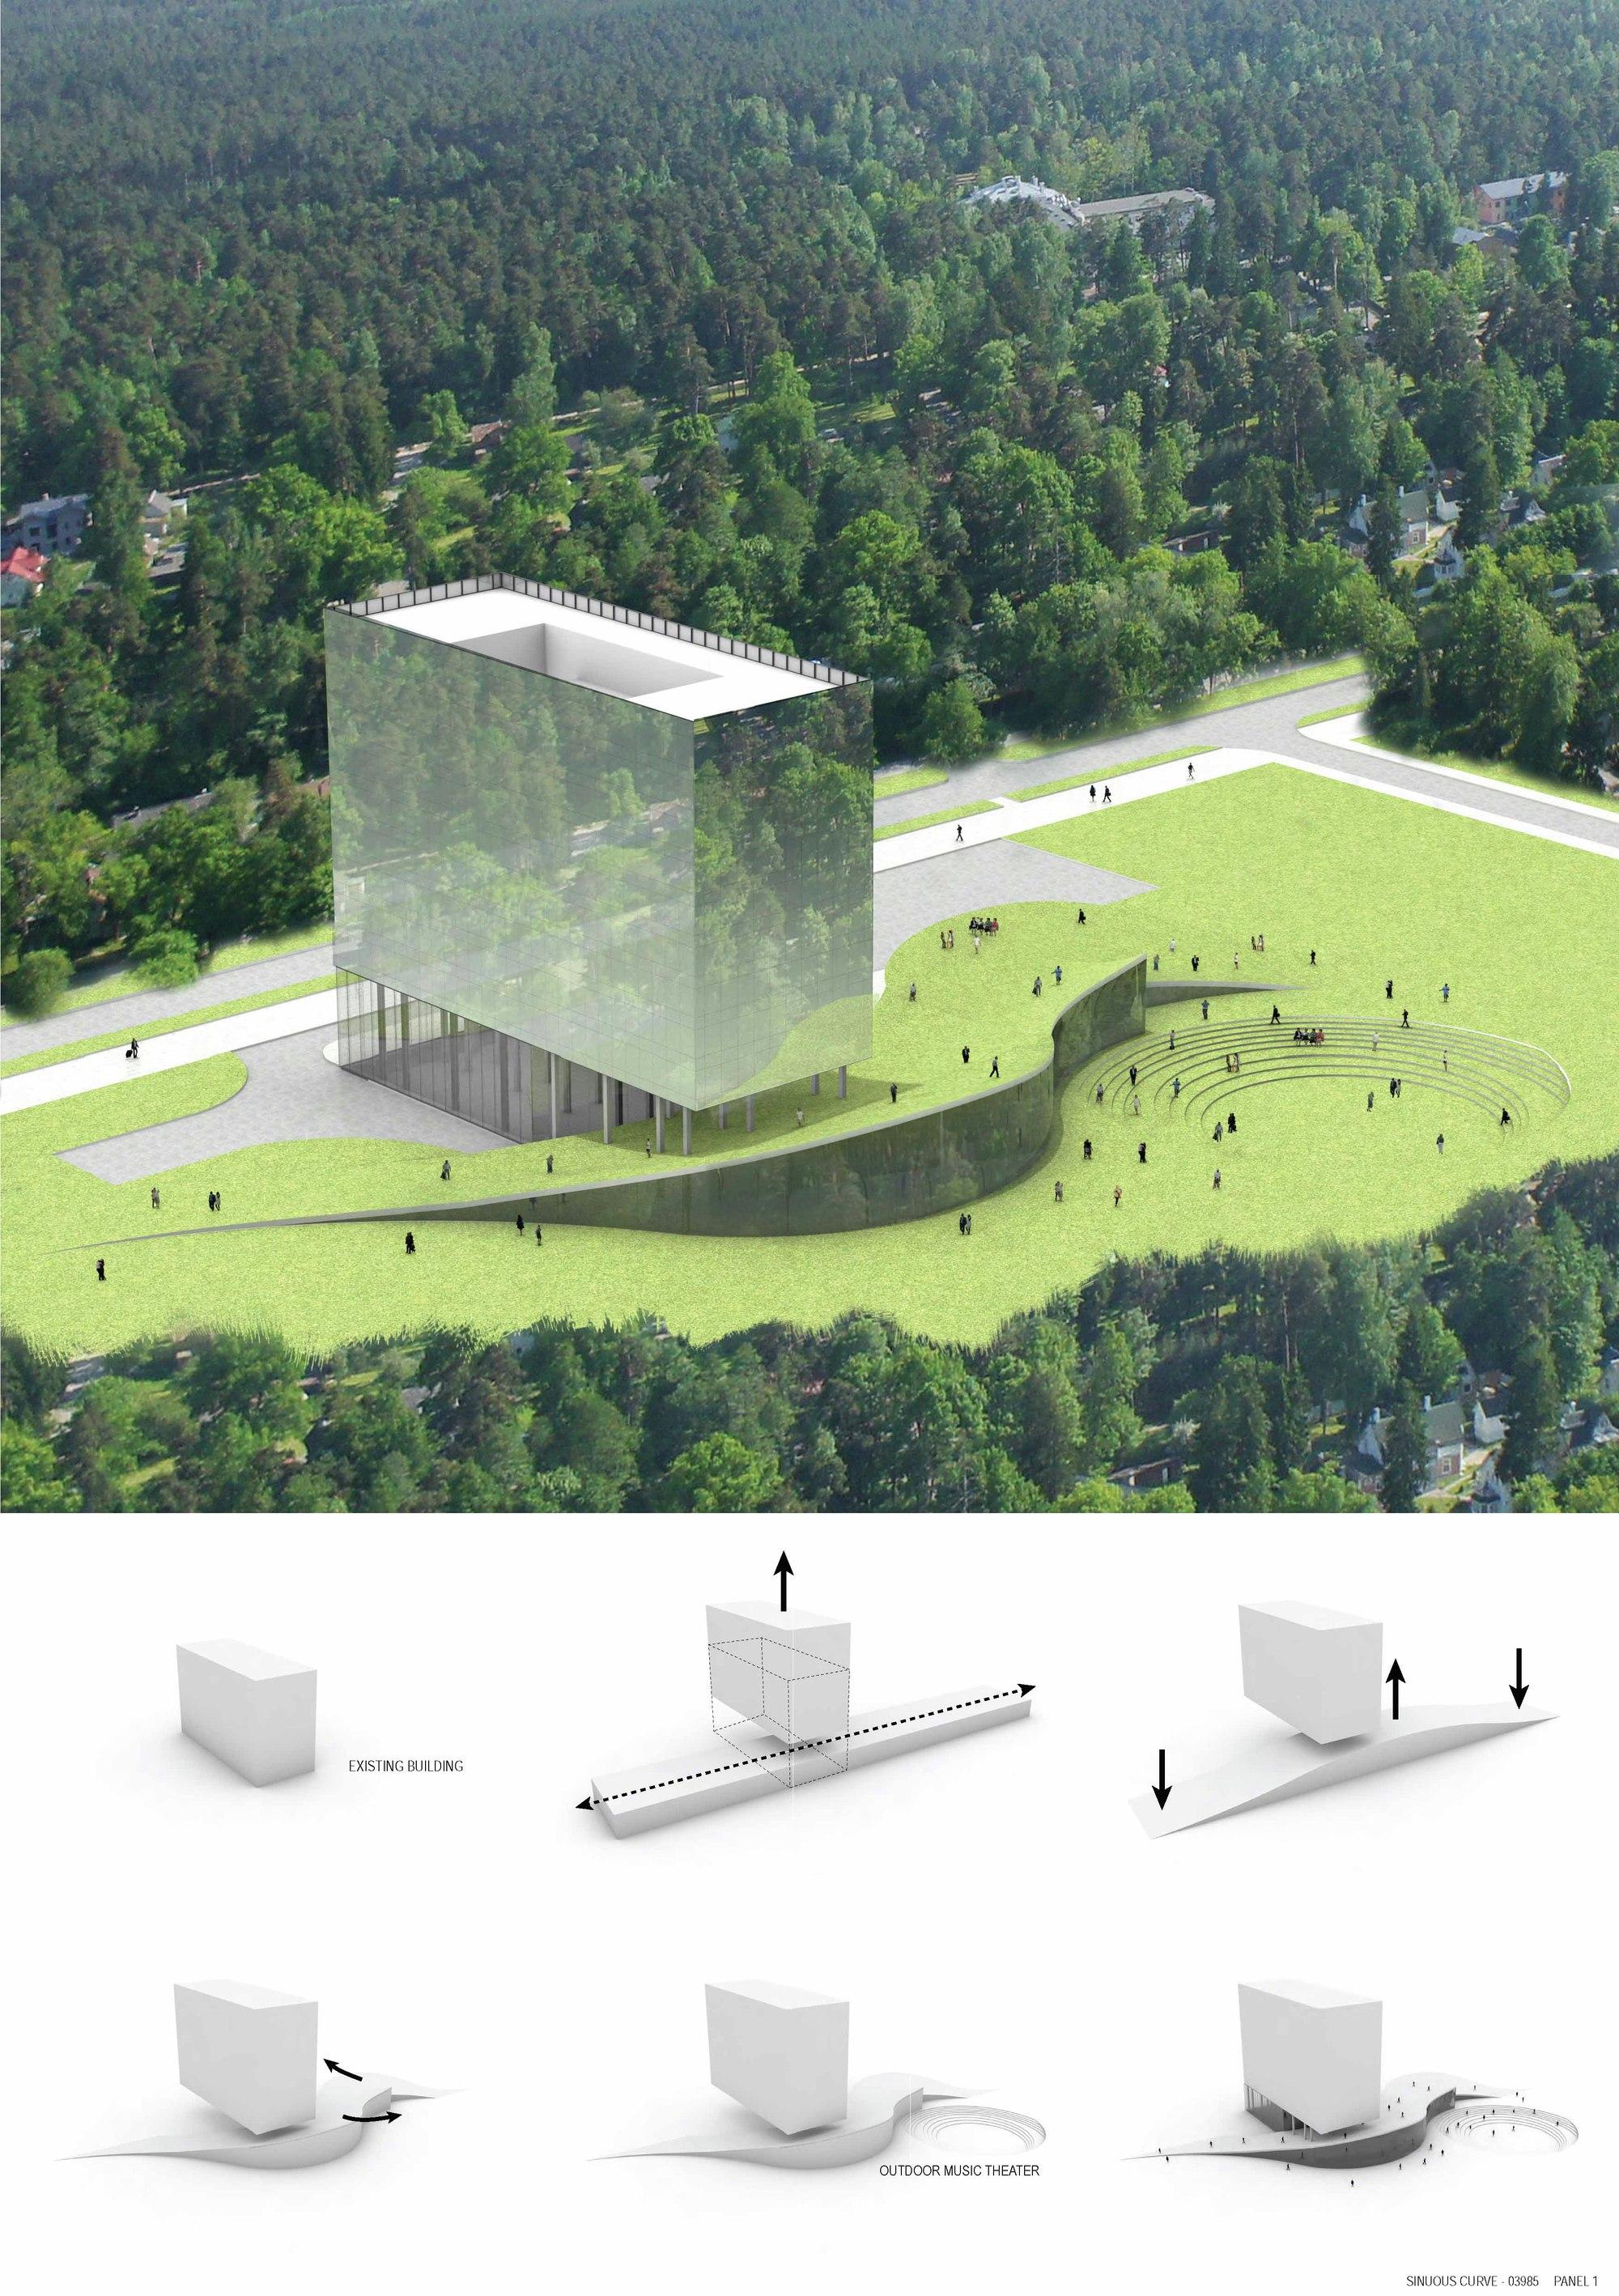 Hotel Liesma Proposal Nobutaka Ashihara Architect 2 4 Competition Board 01